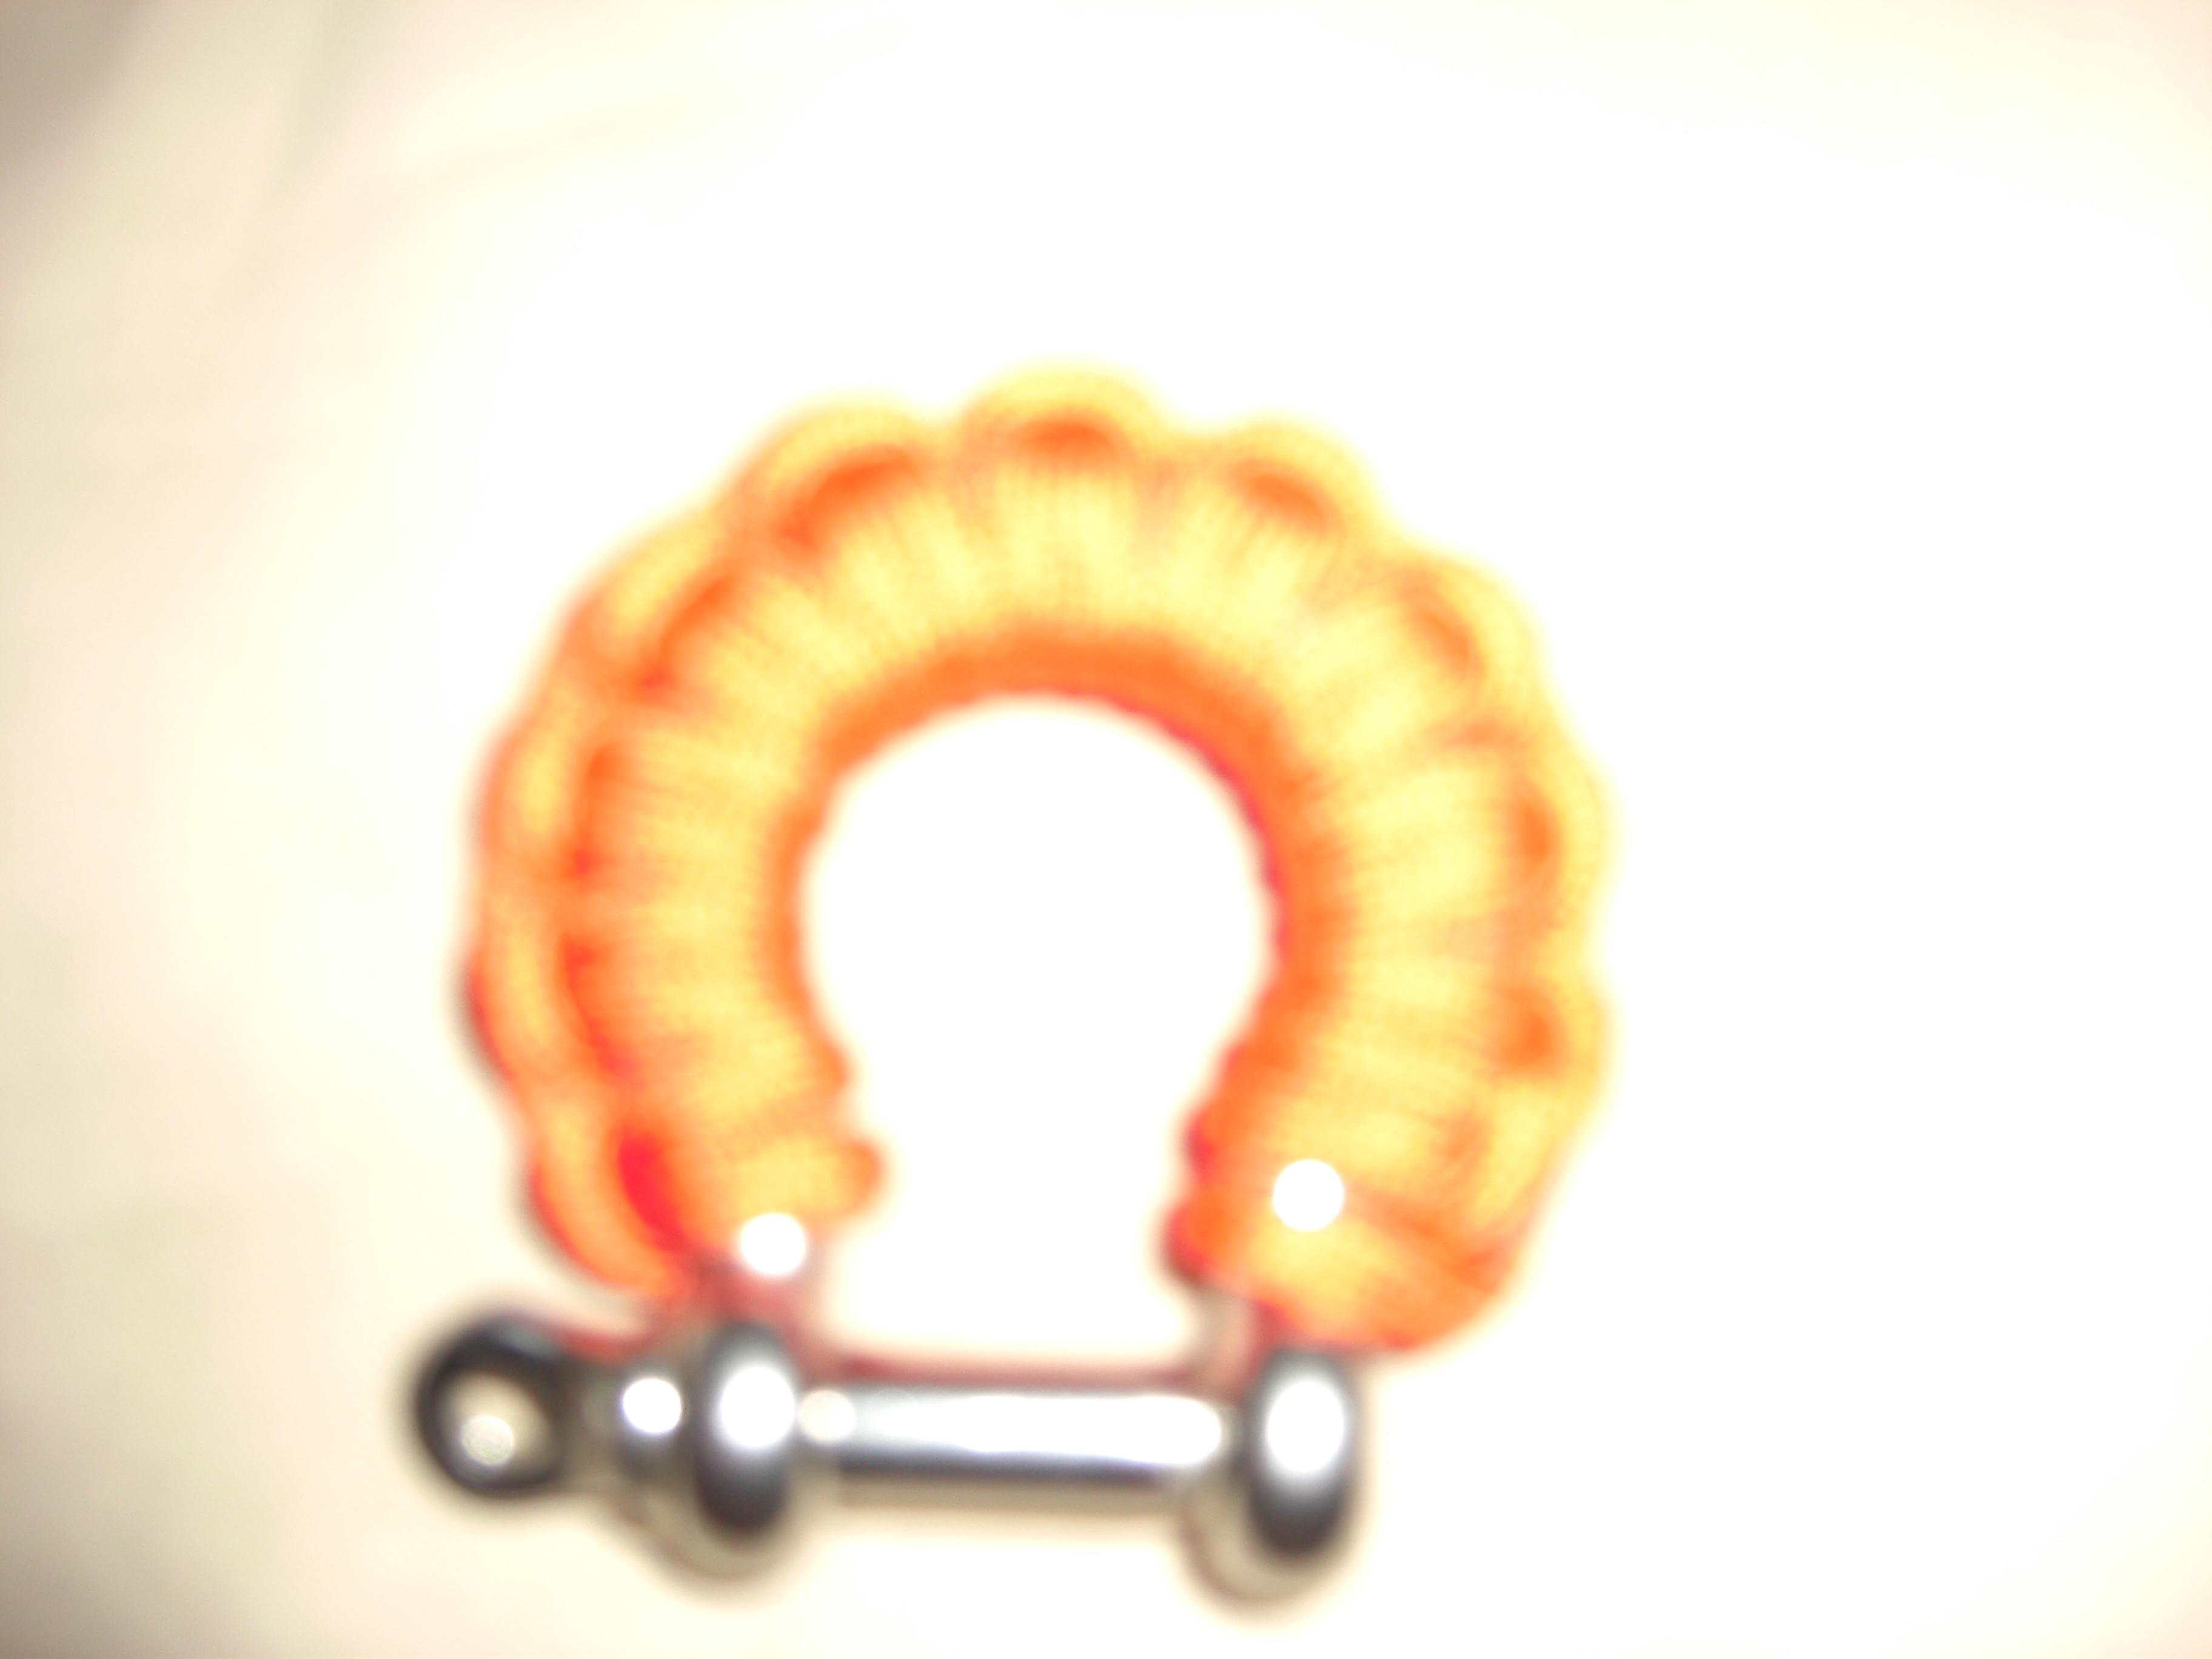 tie a paracord shackle grip